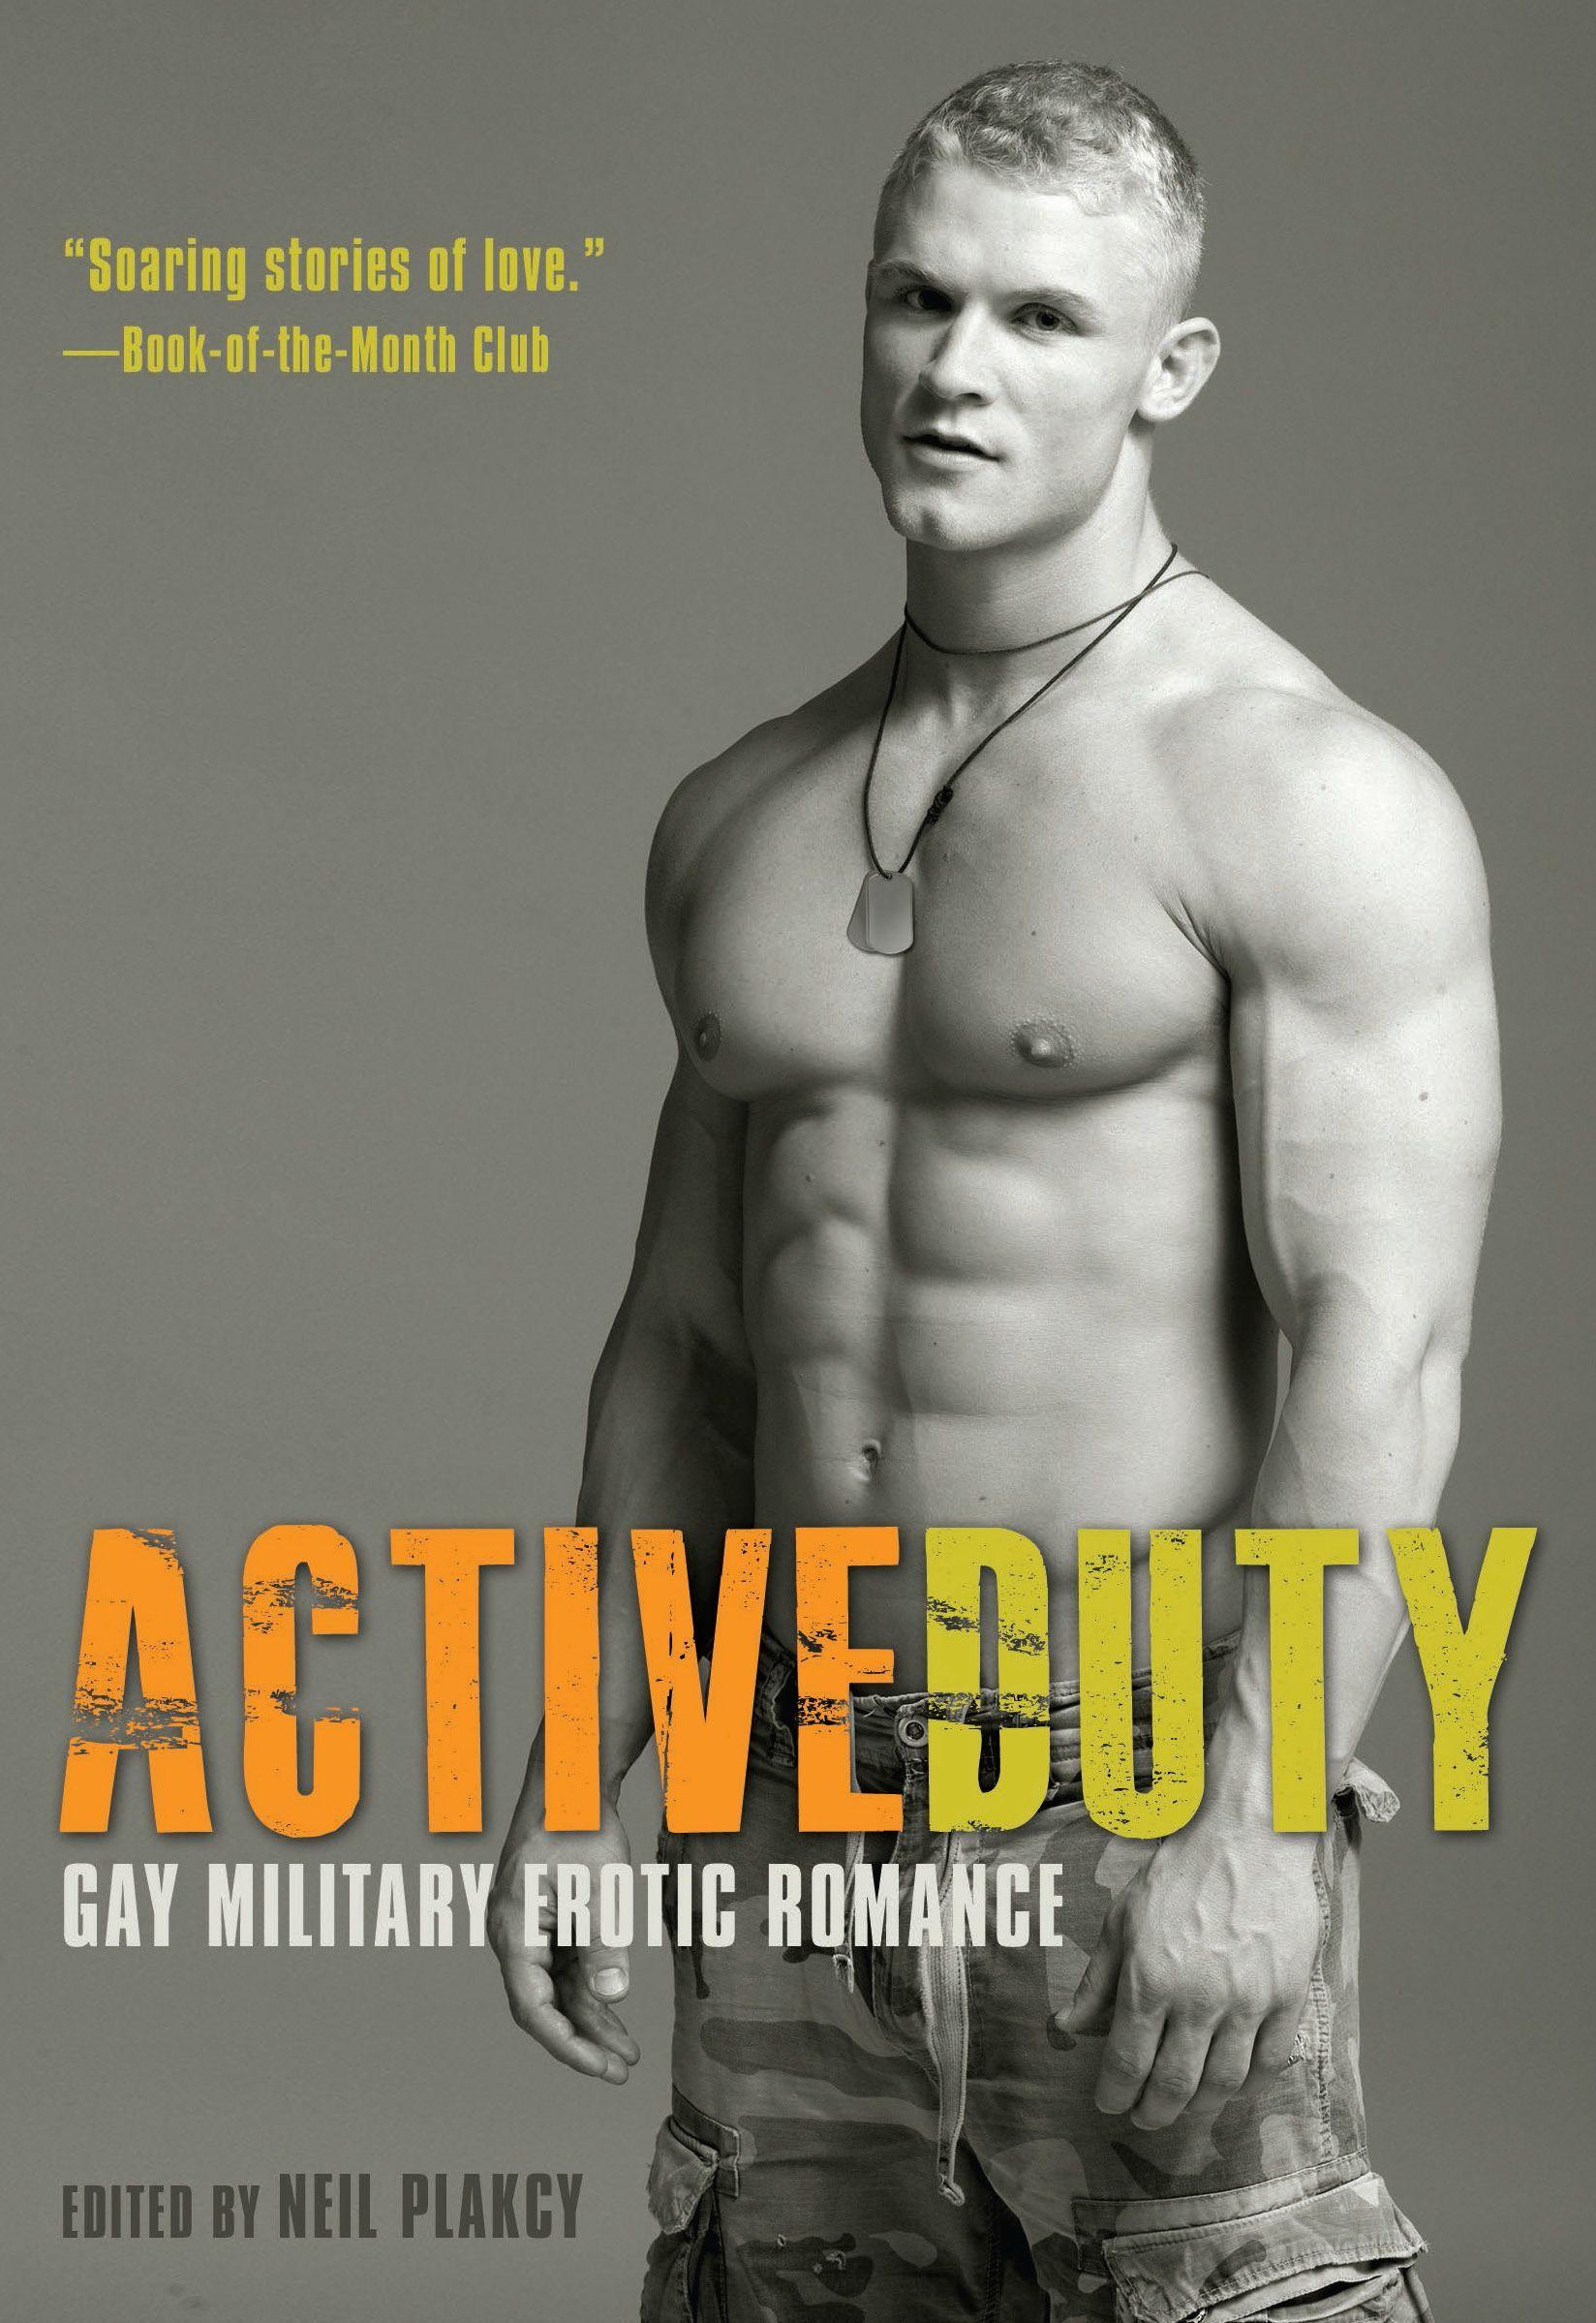 Free gay man erotic story